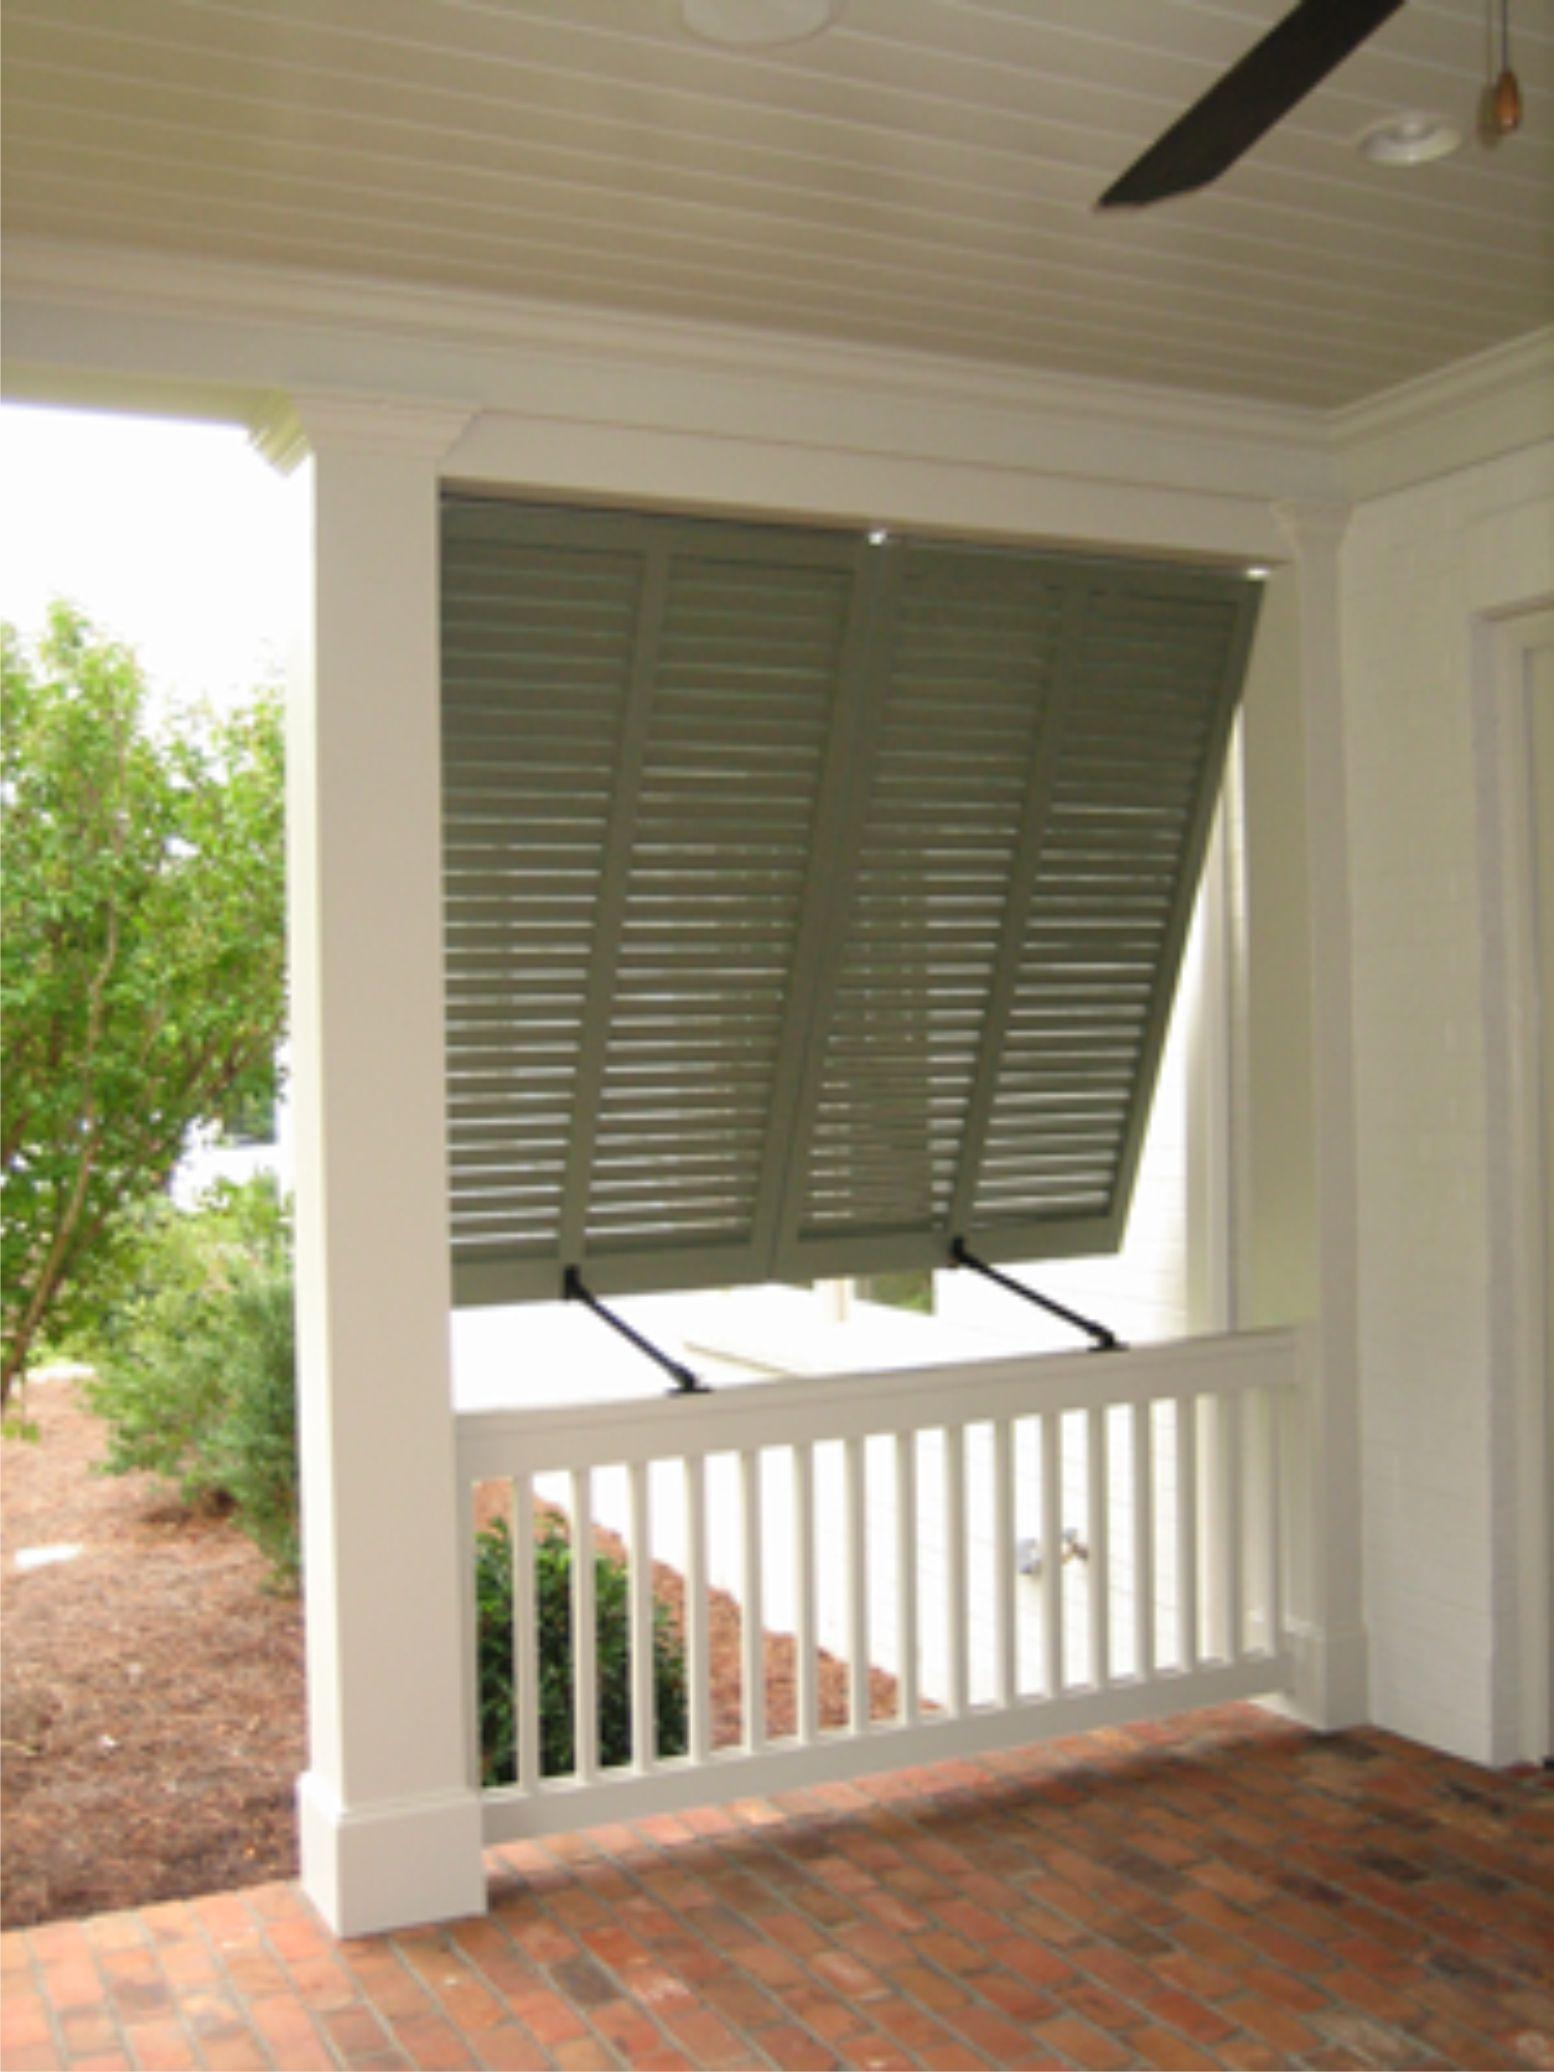 Bahama style window shutters.